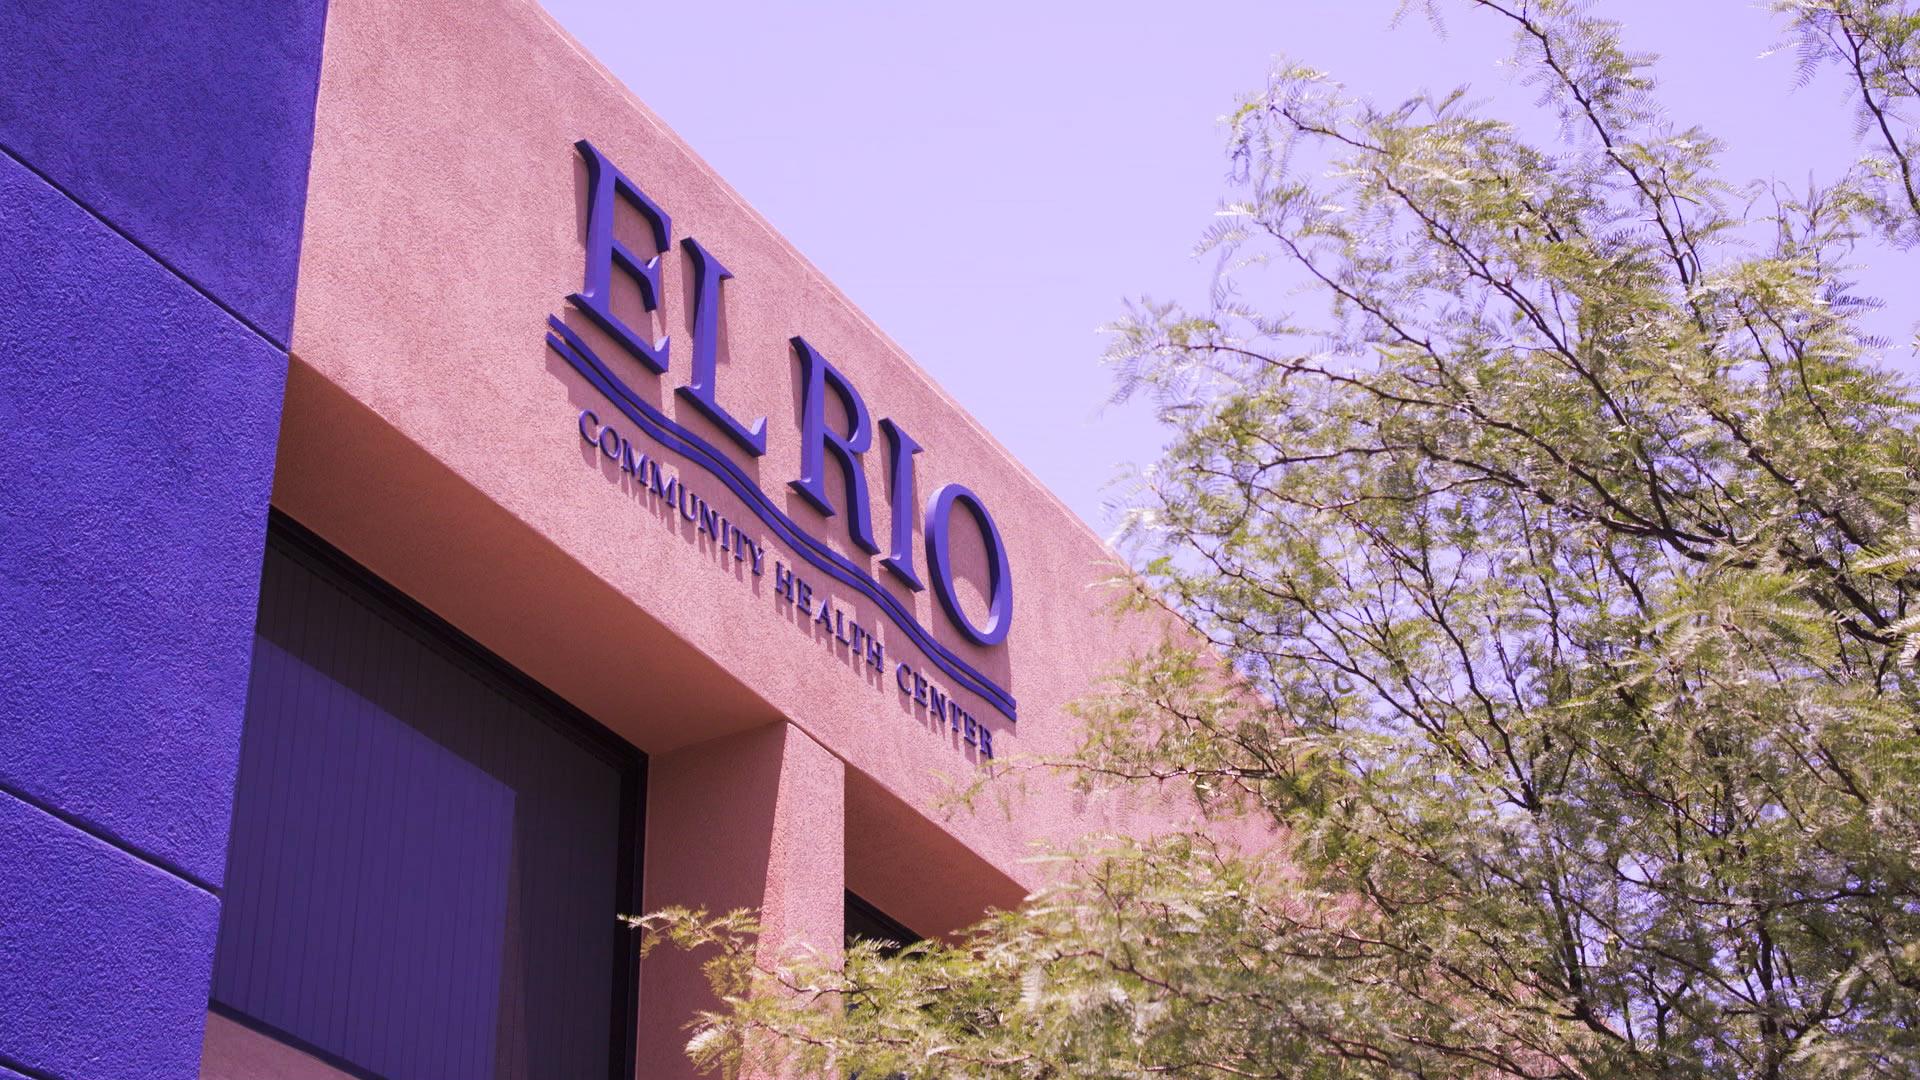 Sign at an El Rio Community Health Center facility.